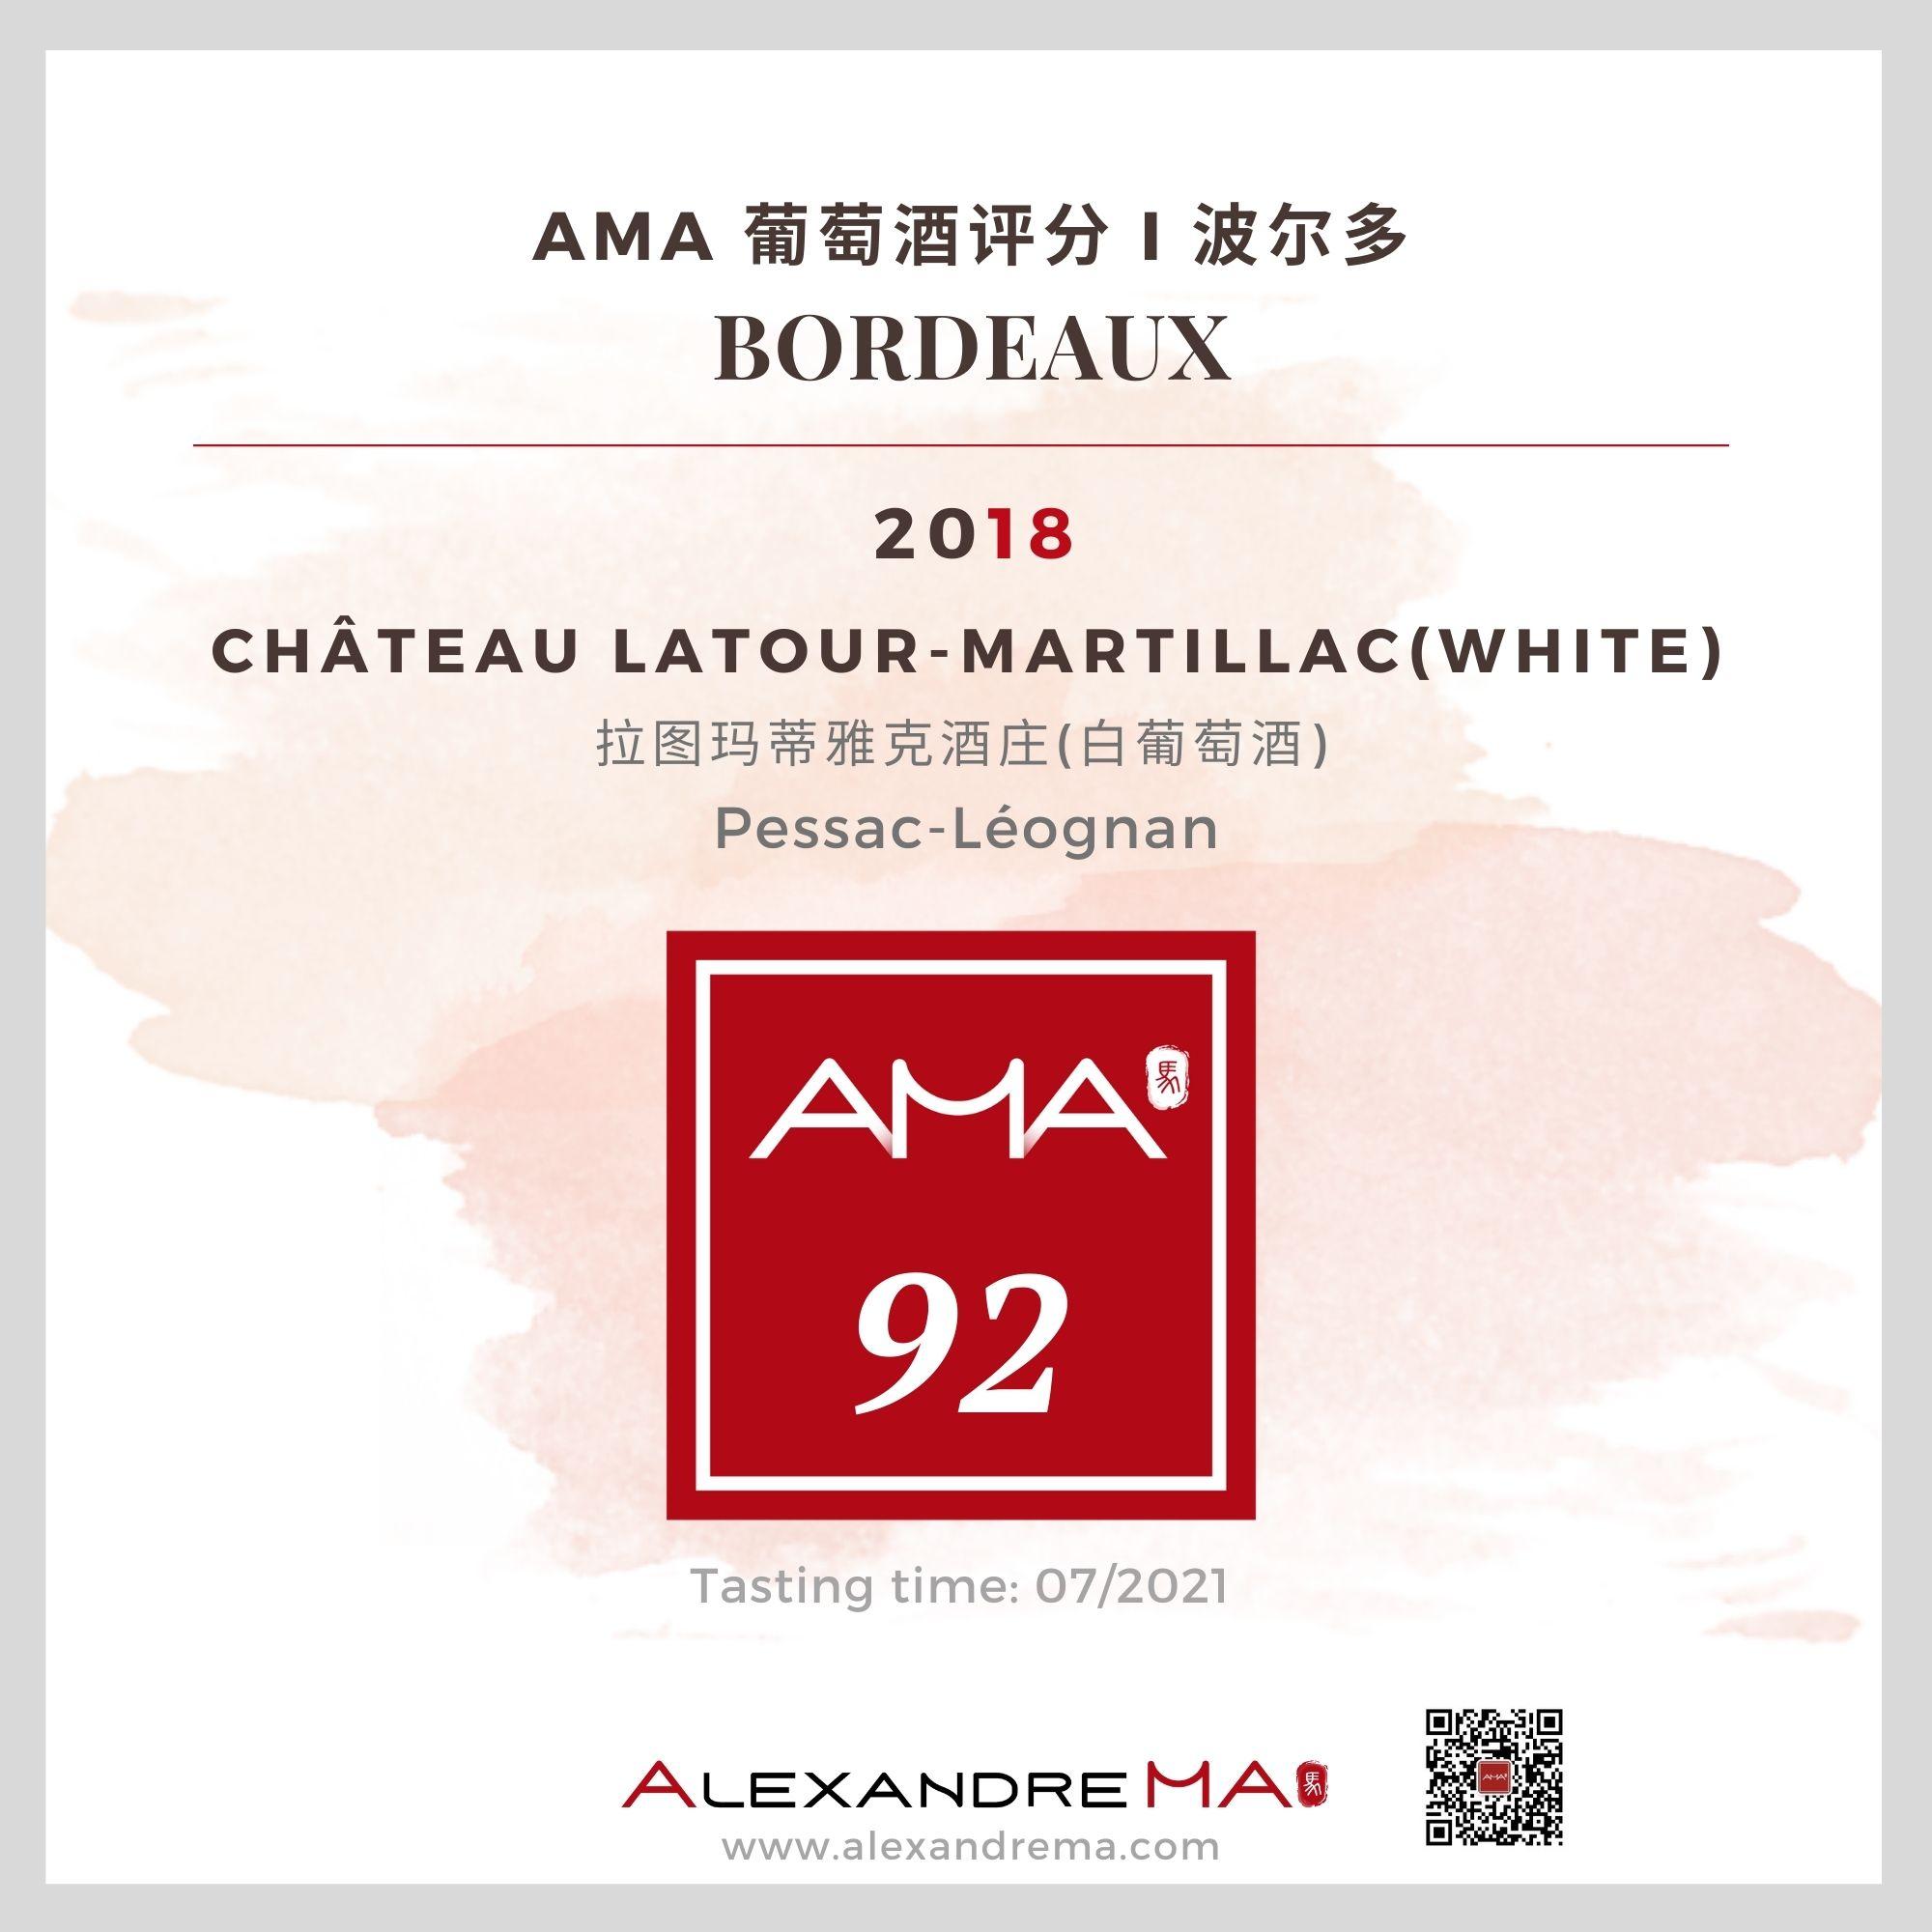 Château Latour-Martillac White 2018 拉图玛蒂雅克酒庄 - Alexandre Ma